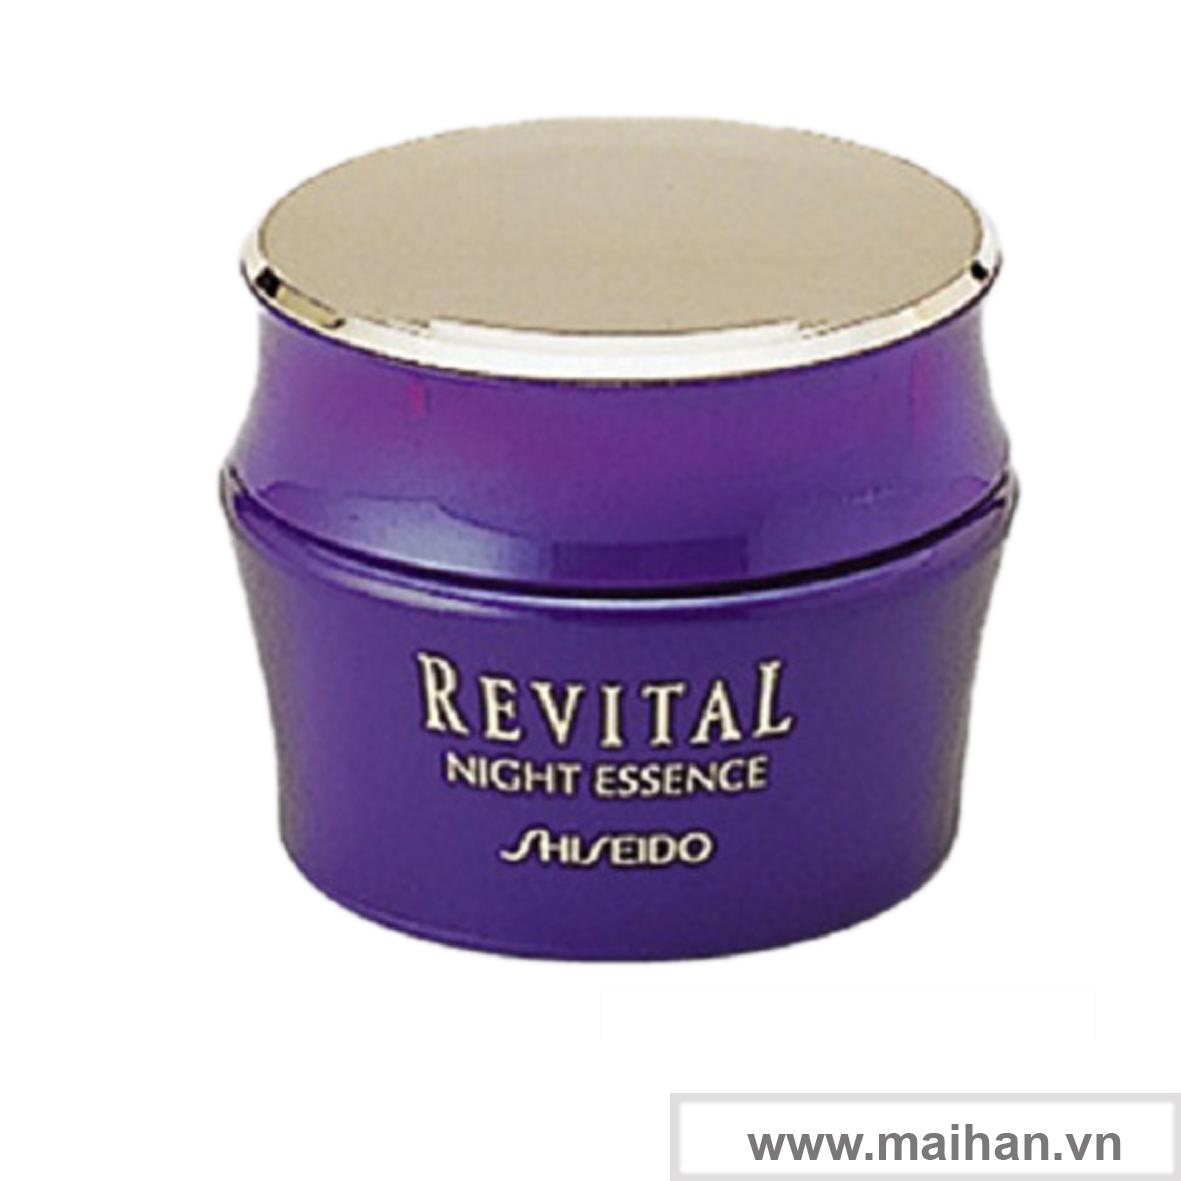 Kem dưỡng đêm Shiseido Revital Night Essence